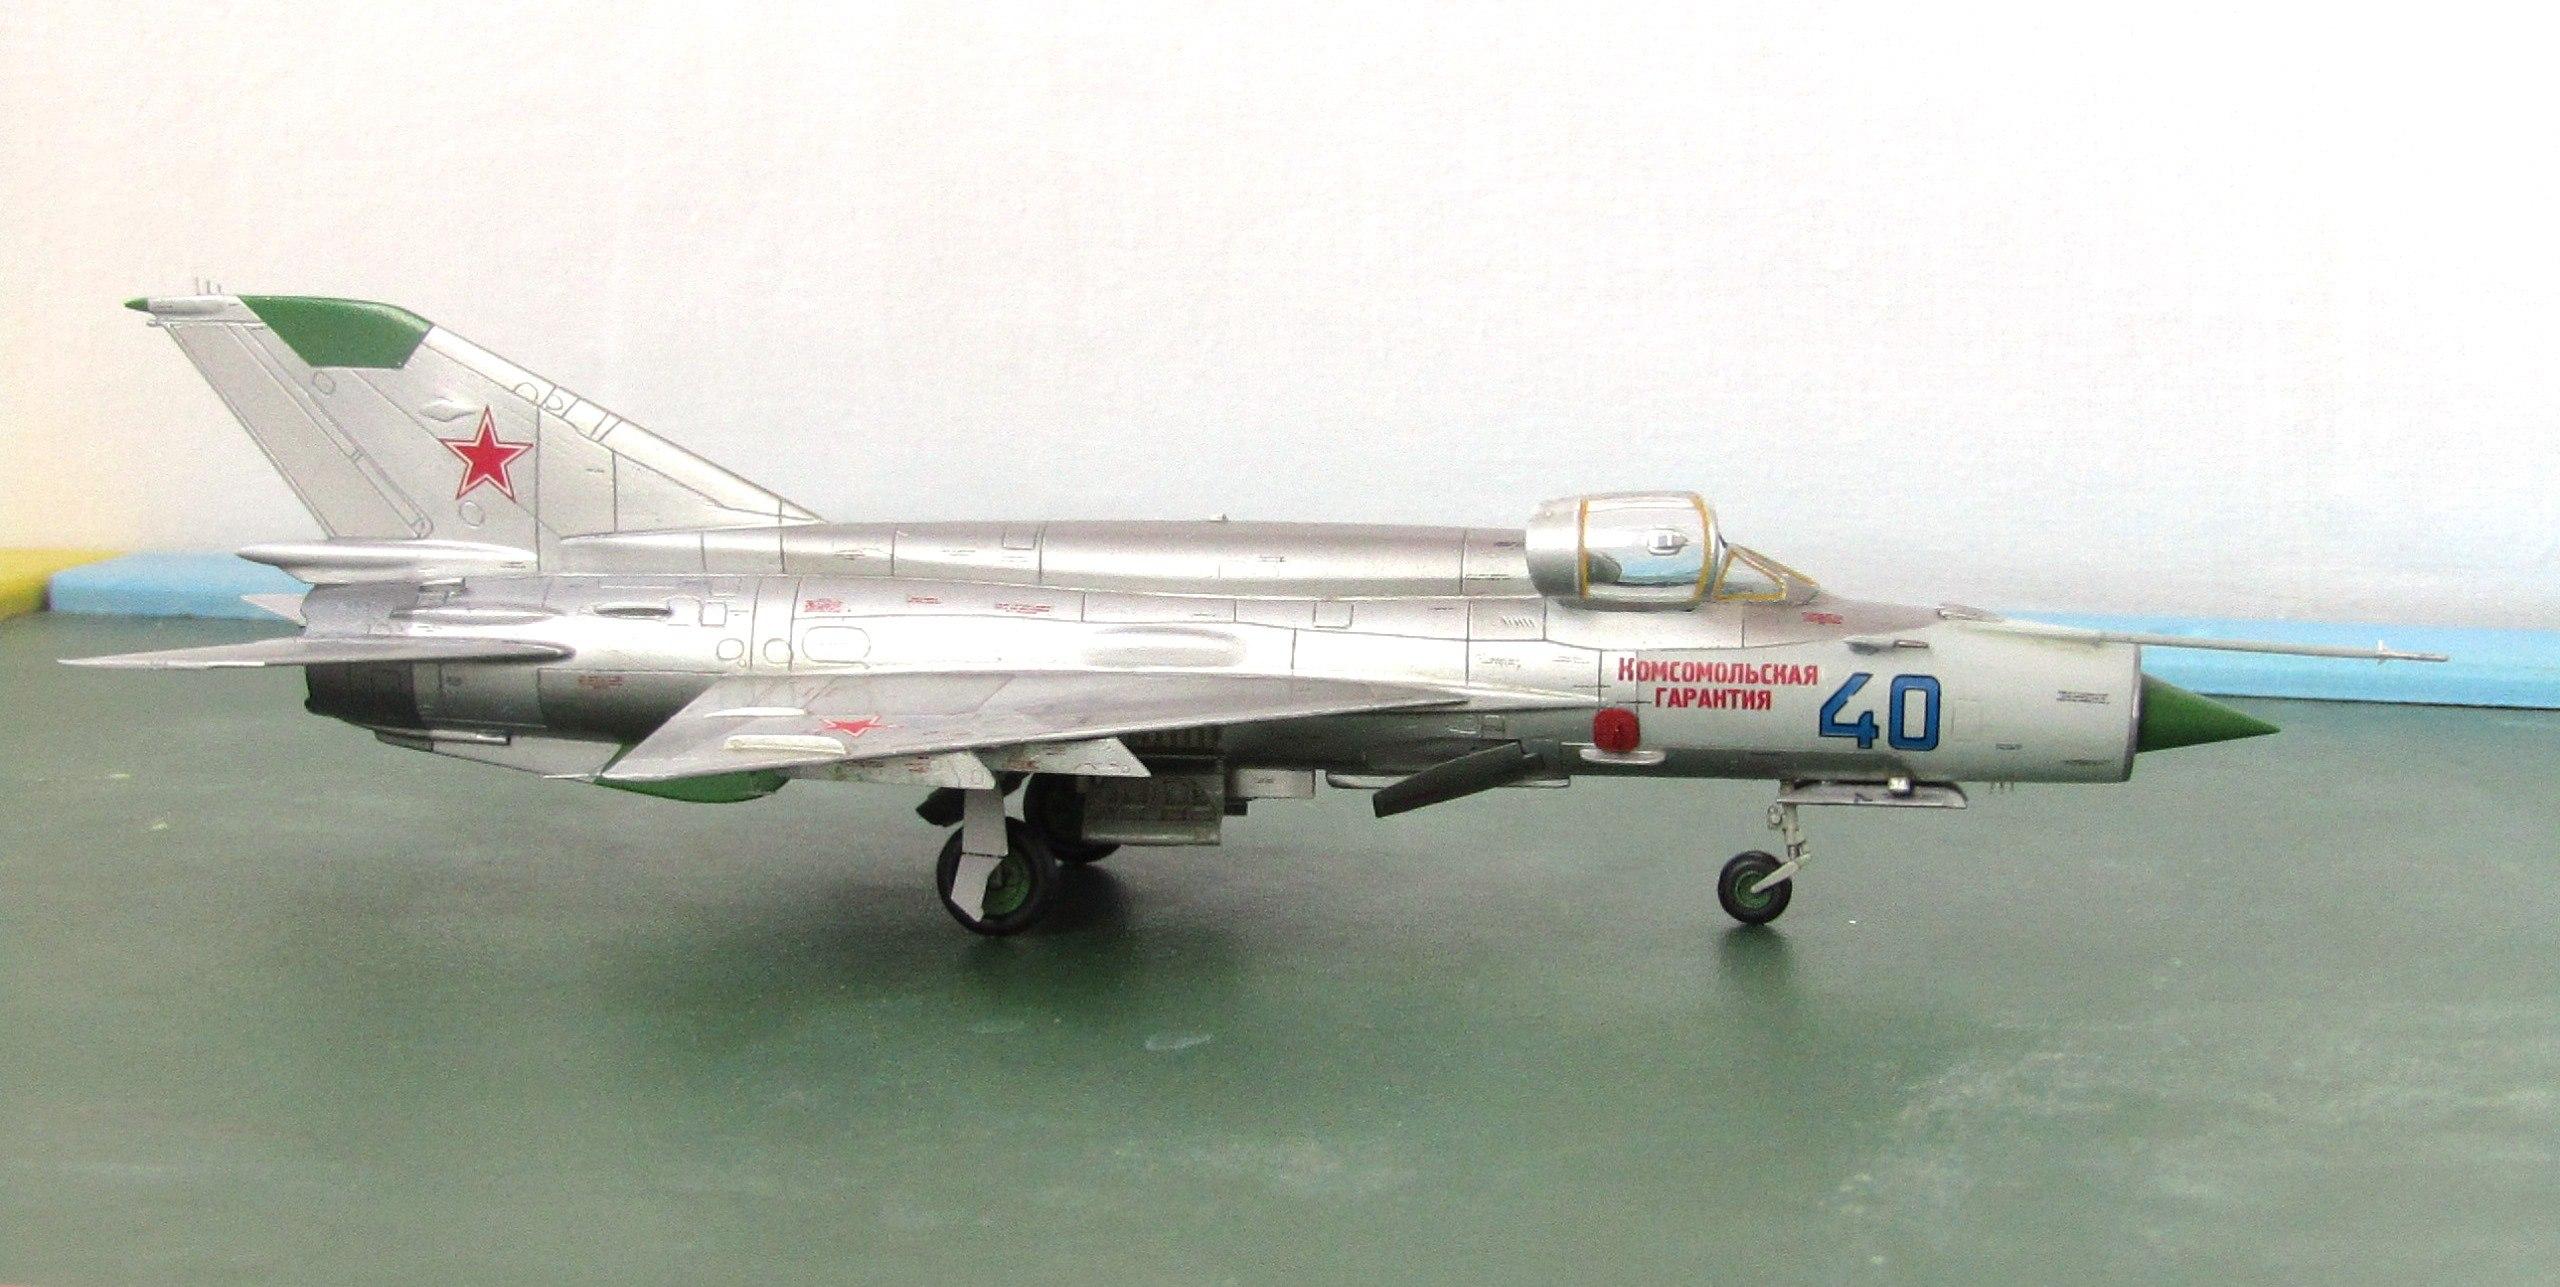 МиГ-21БИС 1/72 (Звезда) Hl7uxUoQ1IU